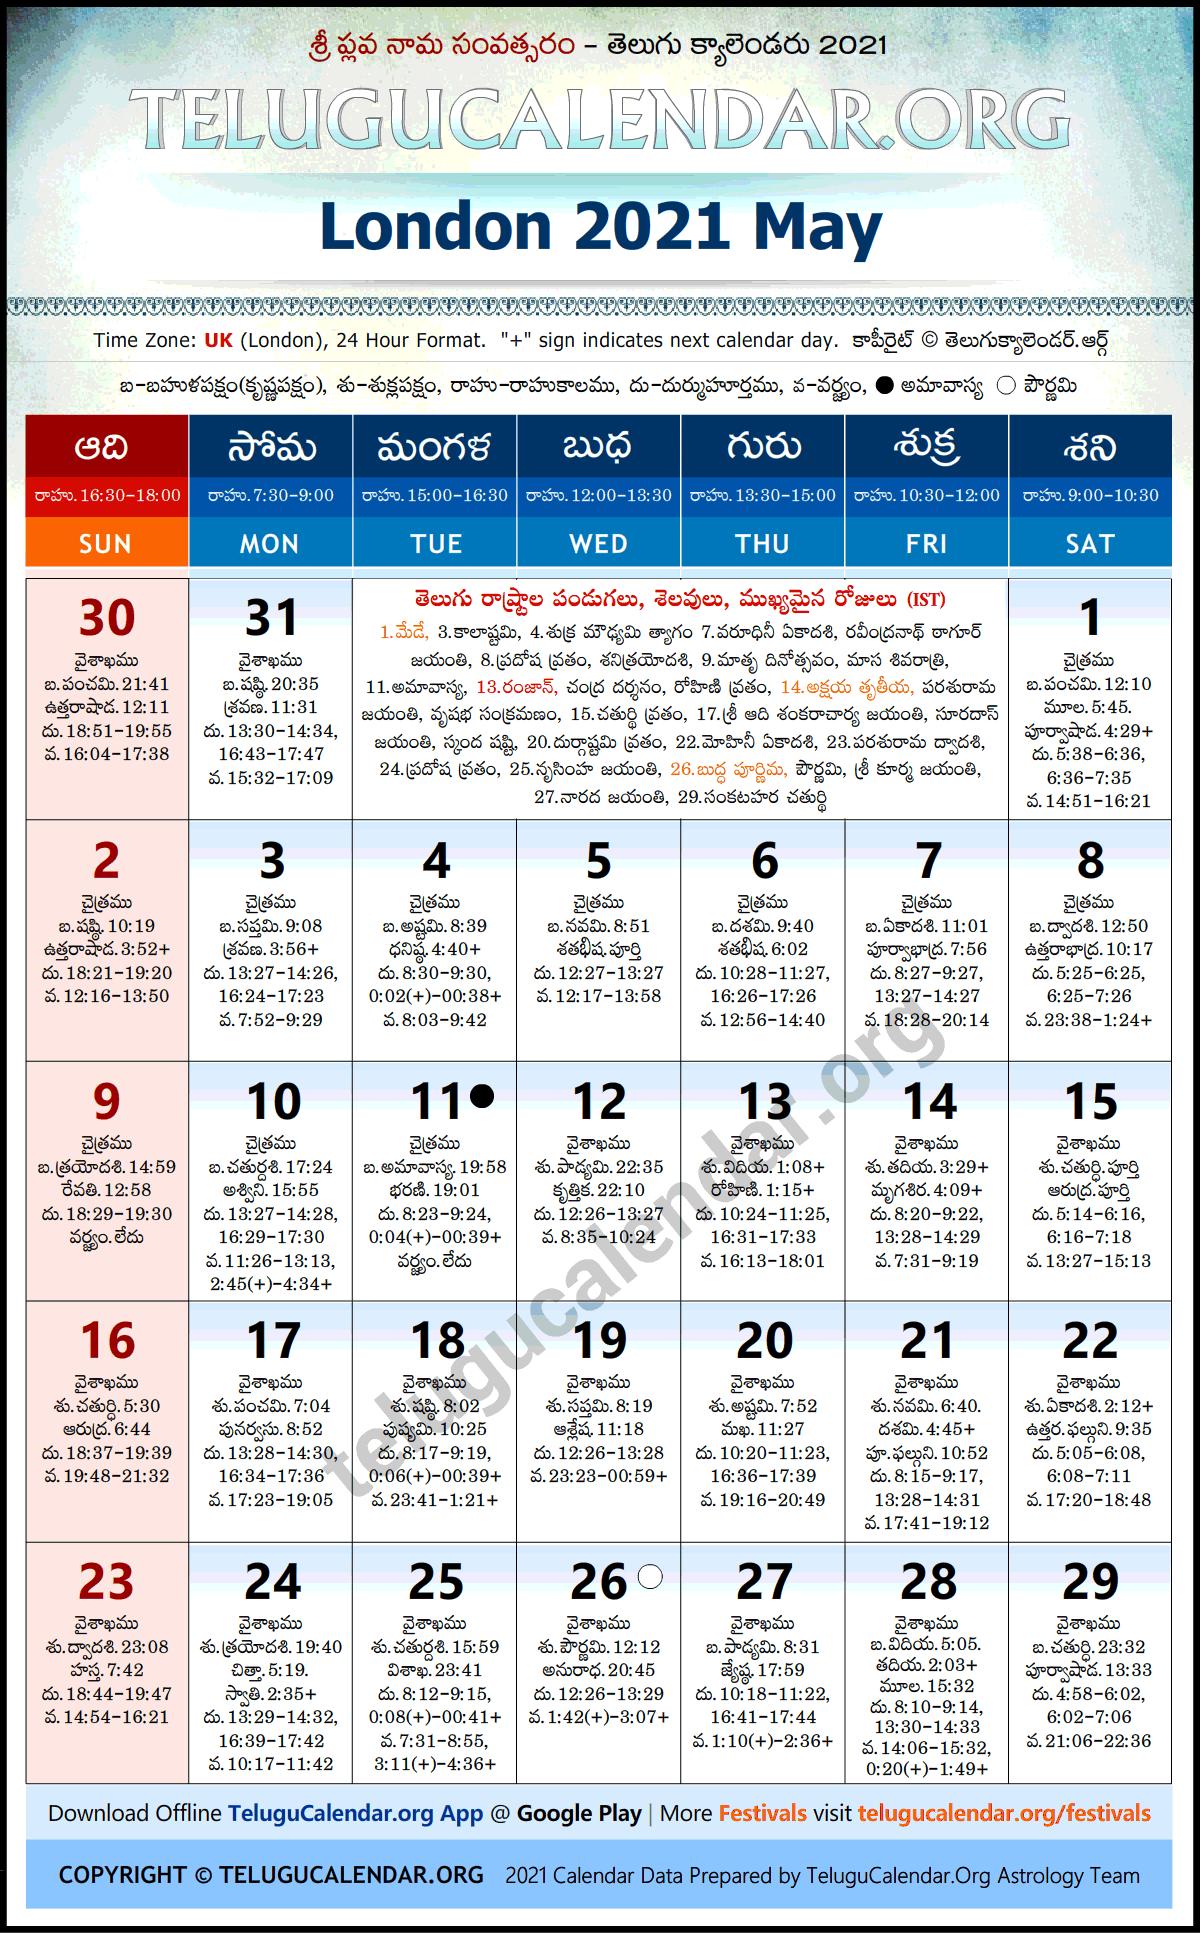 London 2021 May Telugu Calendar Festivals & Holidays